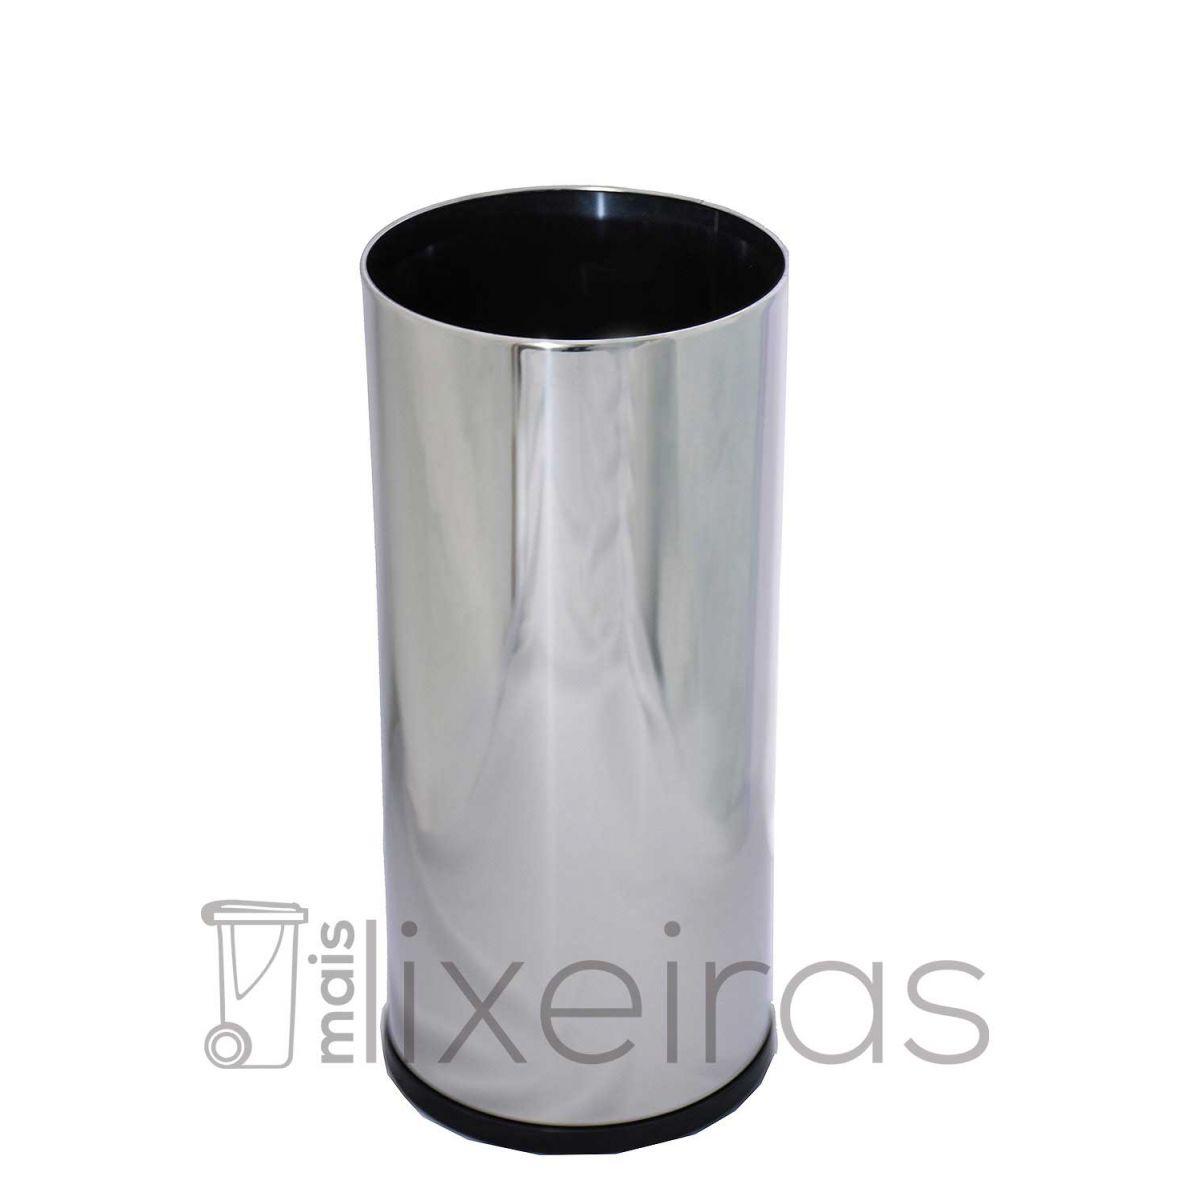 Porta Guarda-Chuva em Aço Inox 24X70 cm